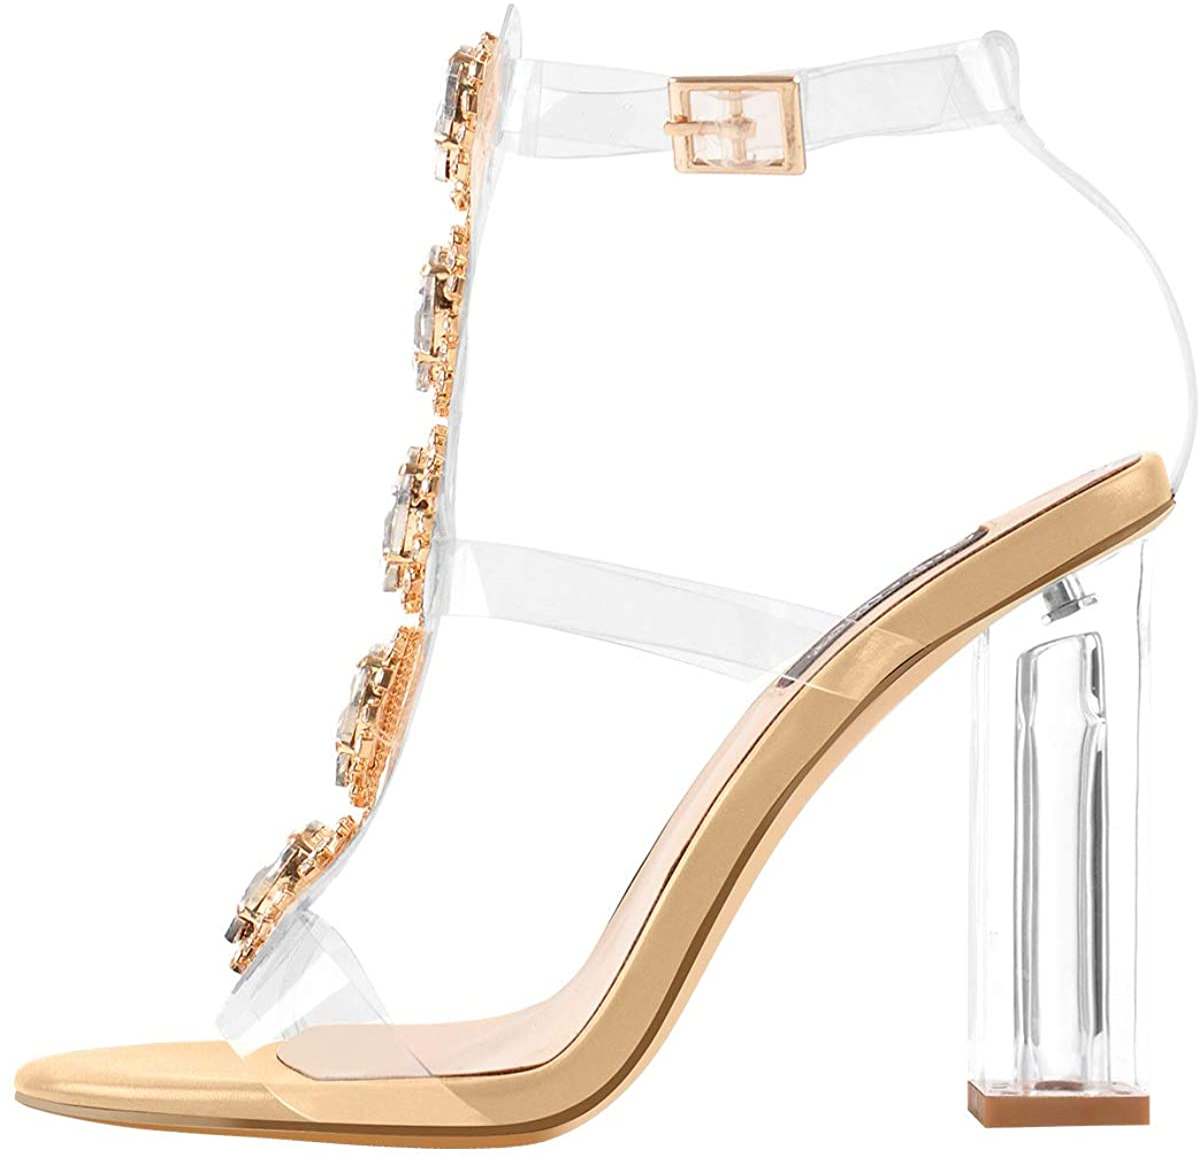 Yolkomo Women's Clear Strappy Gladiator Rhinestones Ankle Strap Sandals